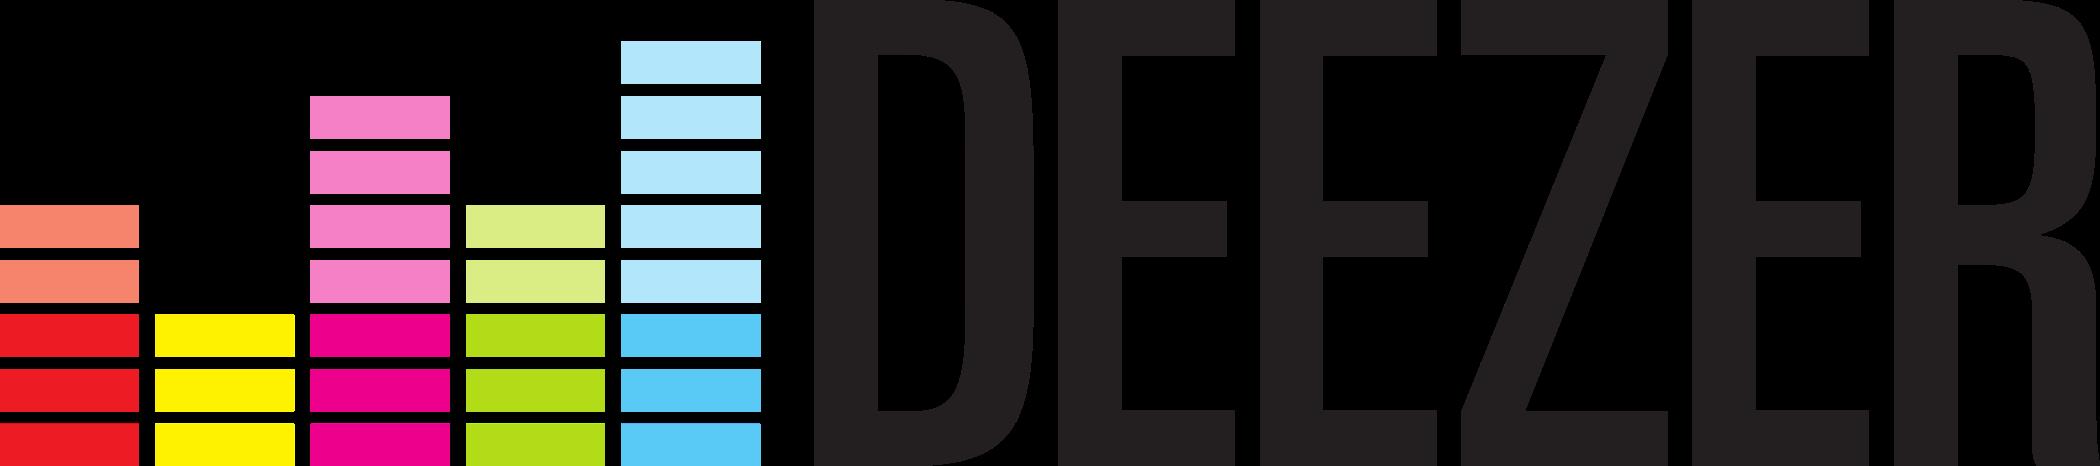 deezer logo 1 - Deezer Logo